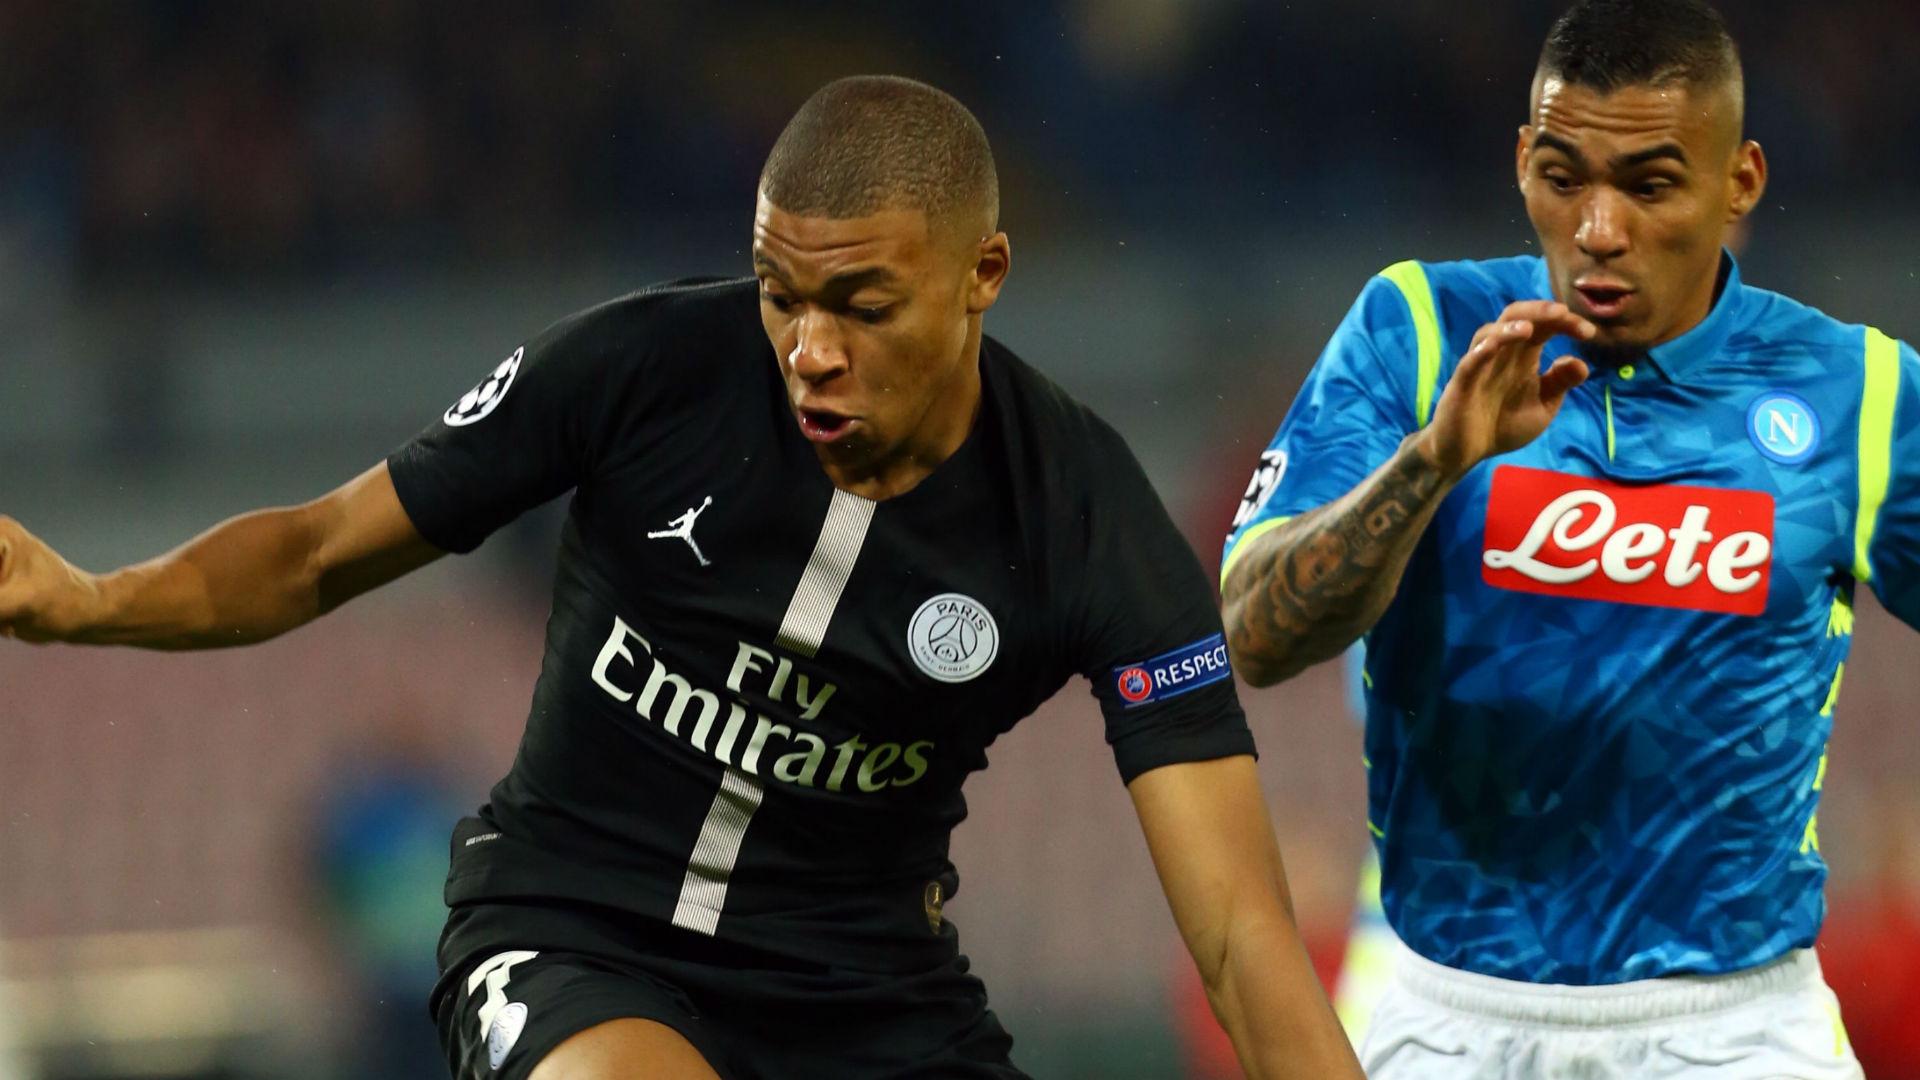 Allan Mbappe Napoli PSG Champions League